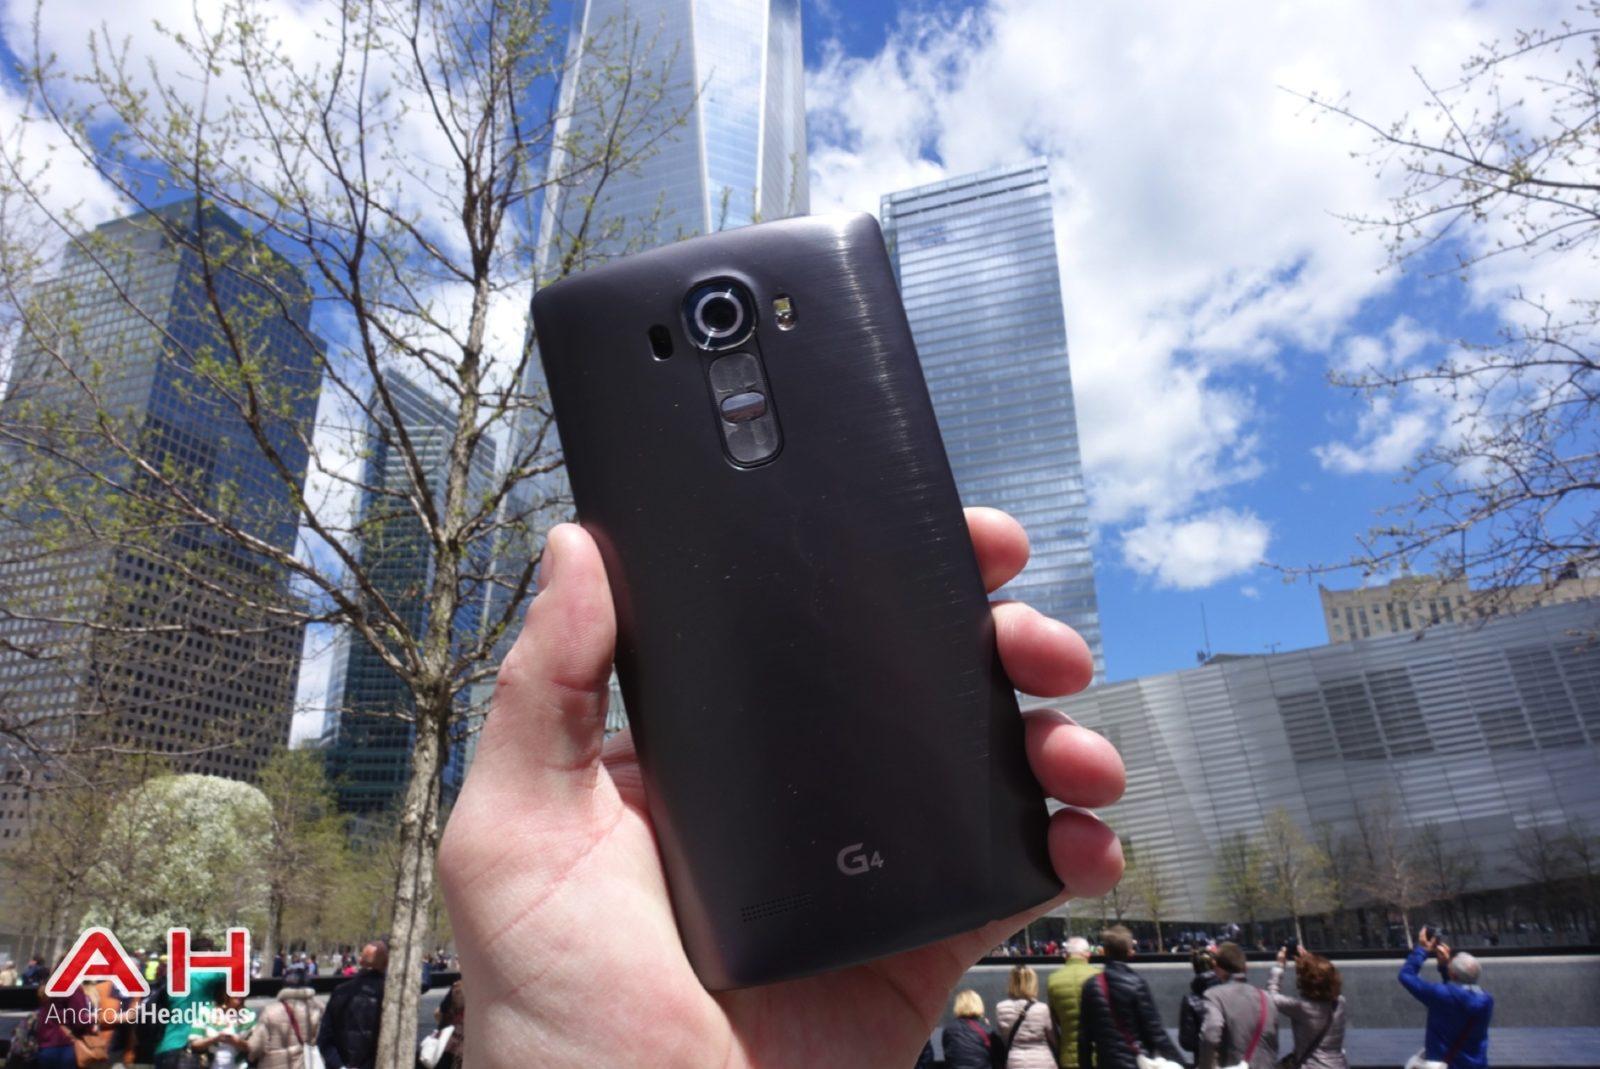 LG G4 01 AH 04